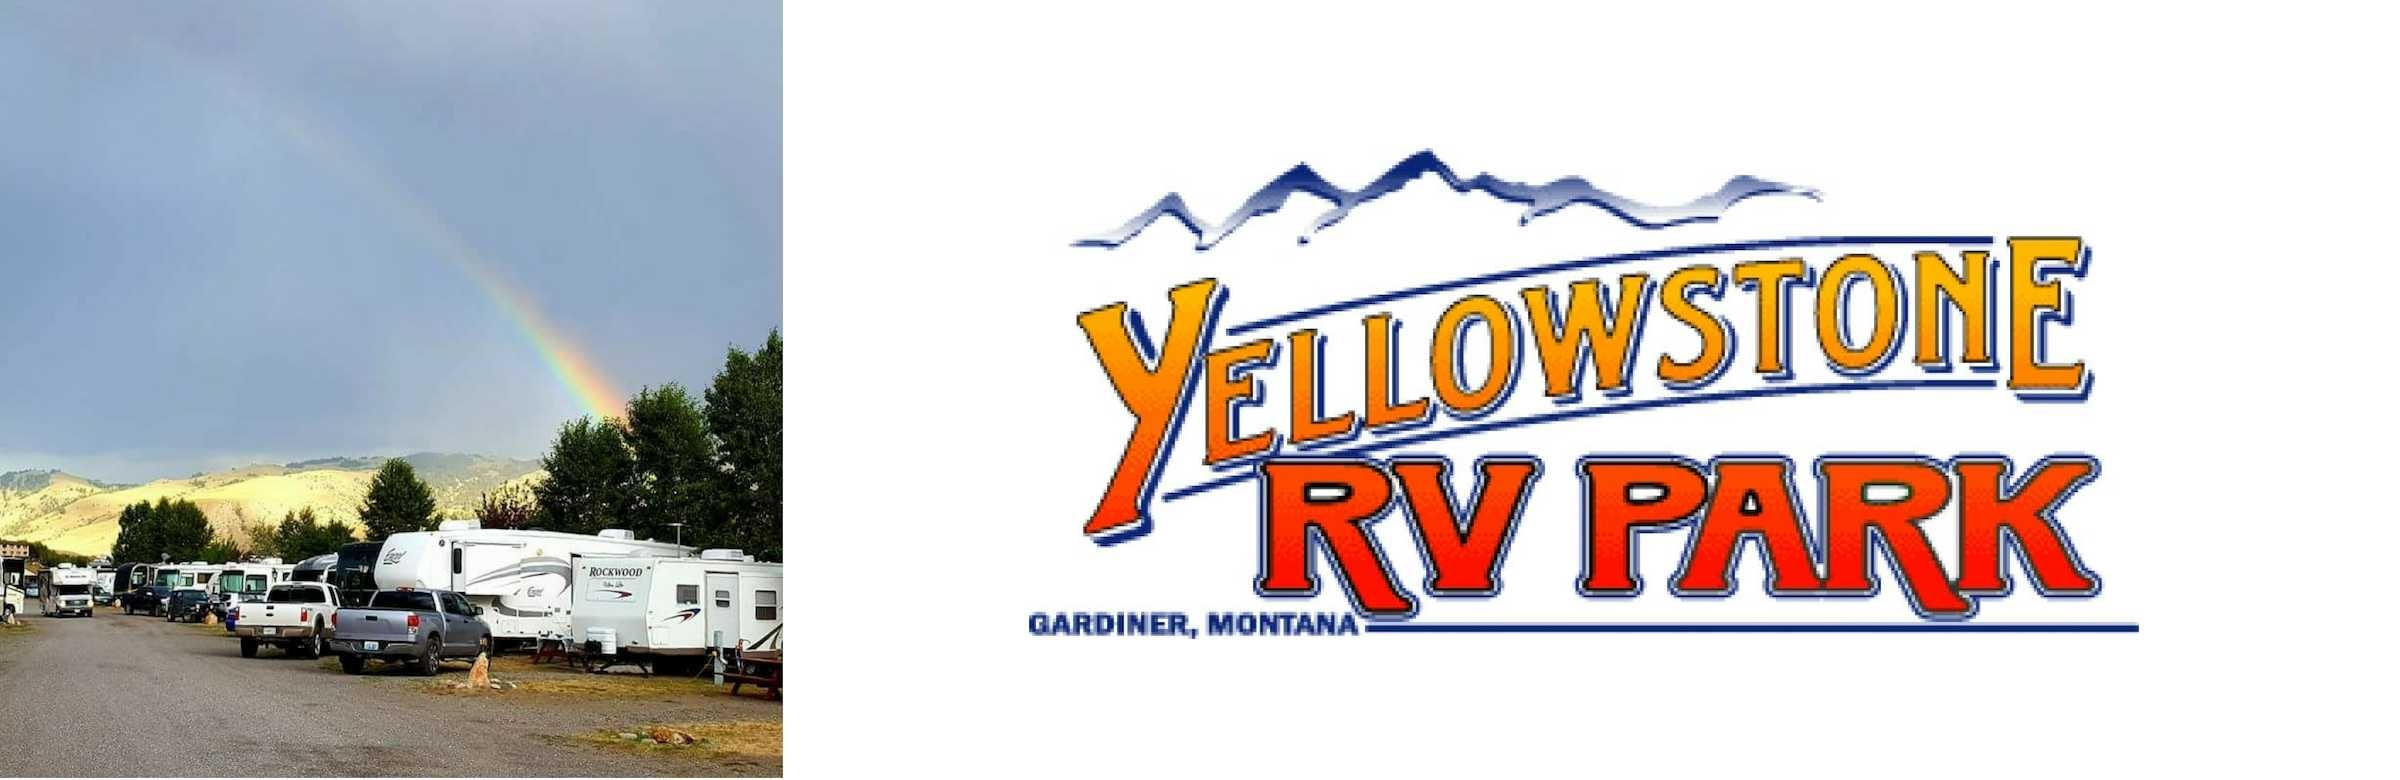 Yellowstone National Park Rv Parks >> Yellowstone Rv Park Campground Gardiner Montana